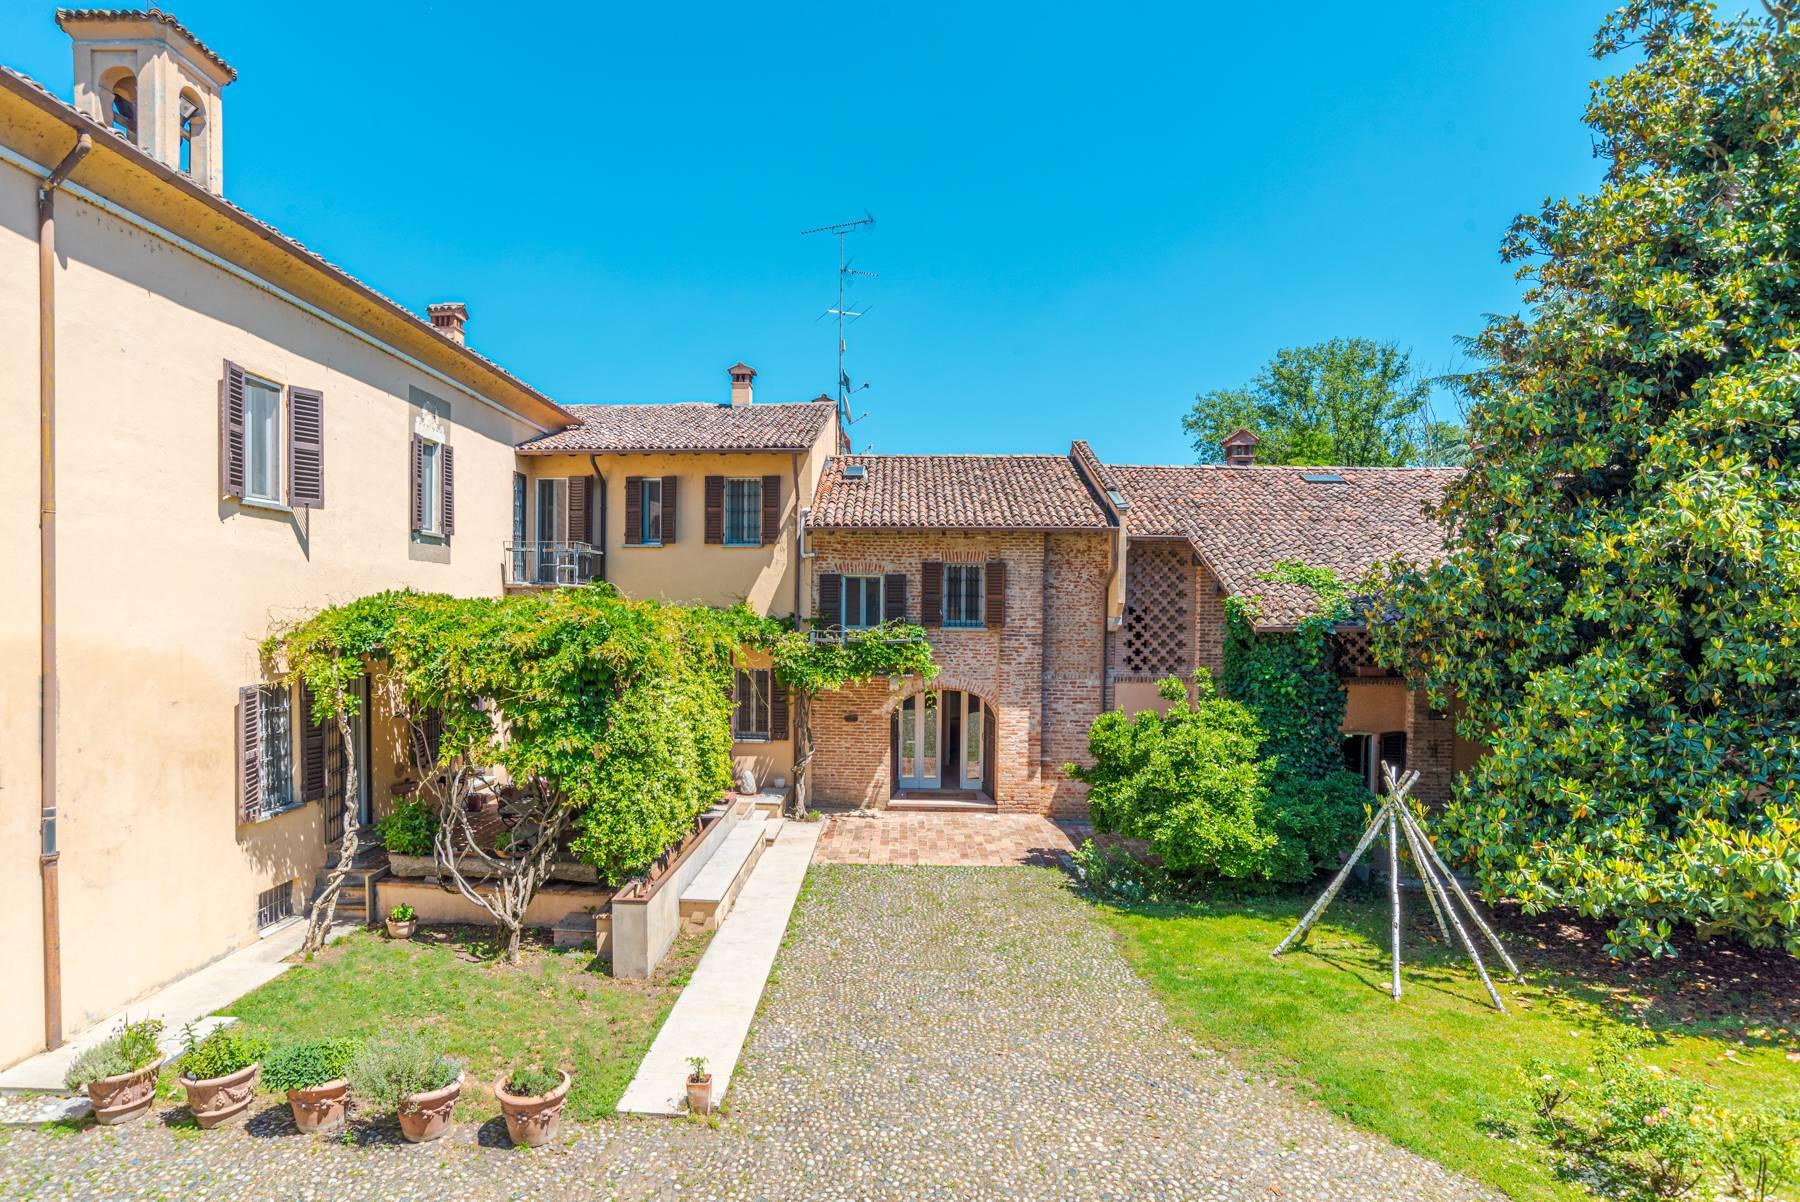 Magnifica proprietà immersa nel verde a Pavia - 7